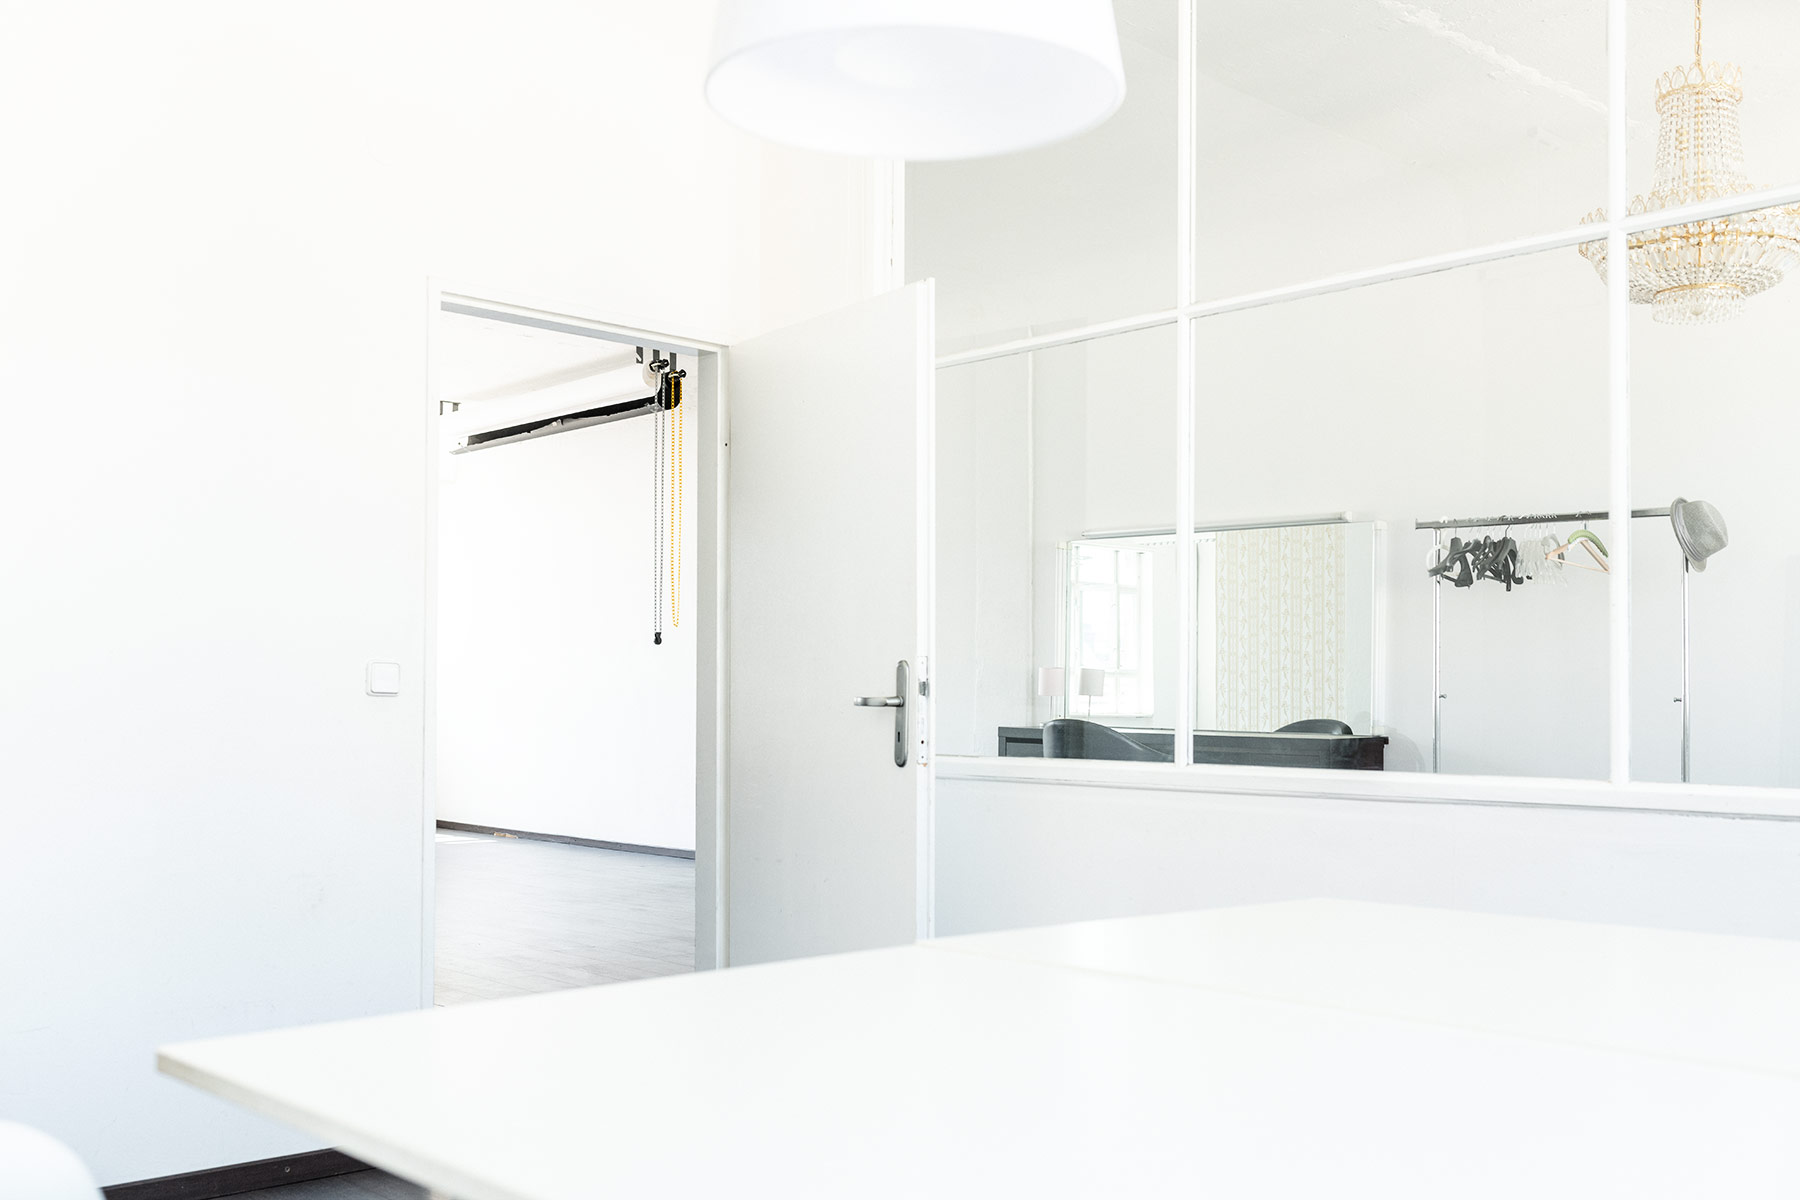 Mietstudio für Fotografen Berlin Blick aus dem Office